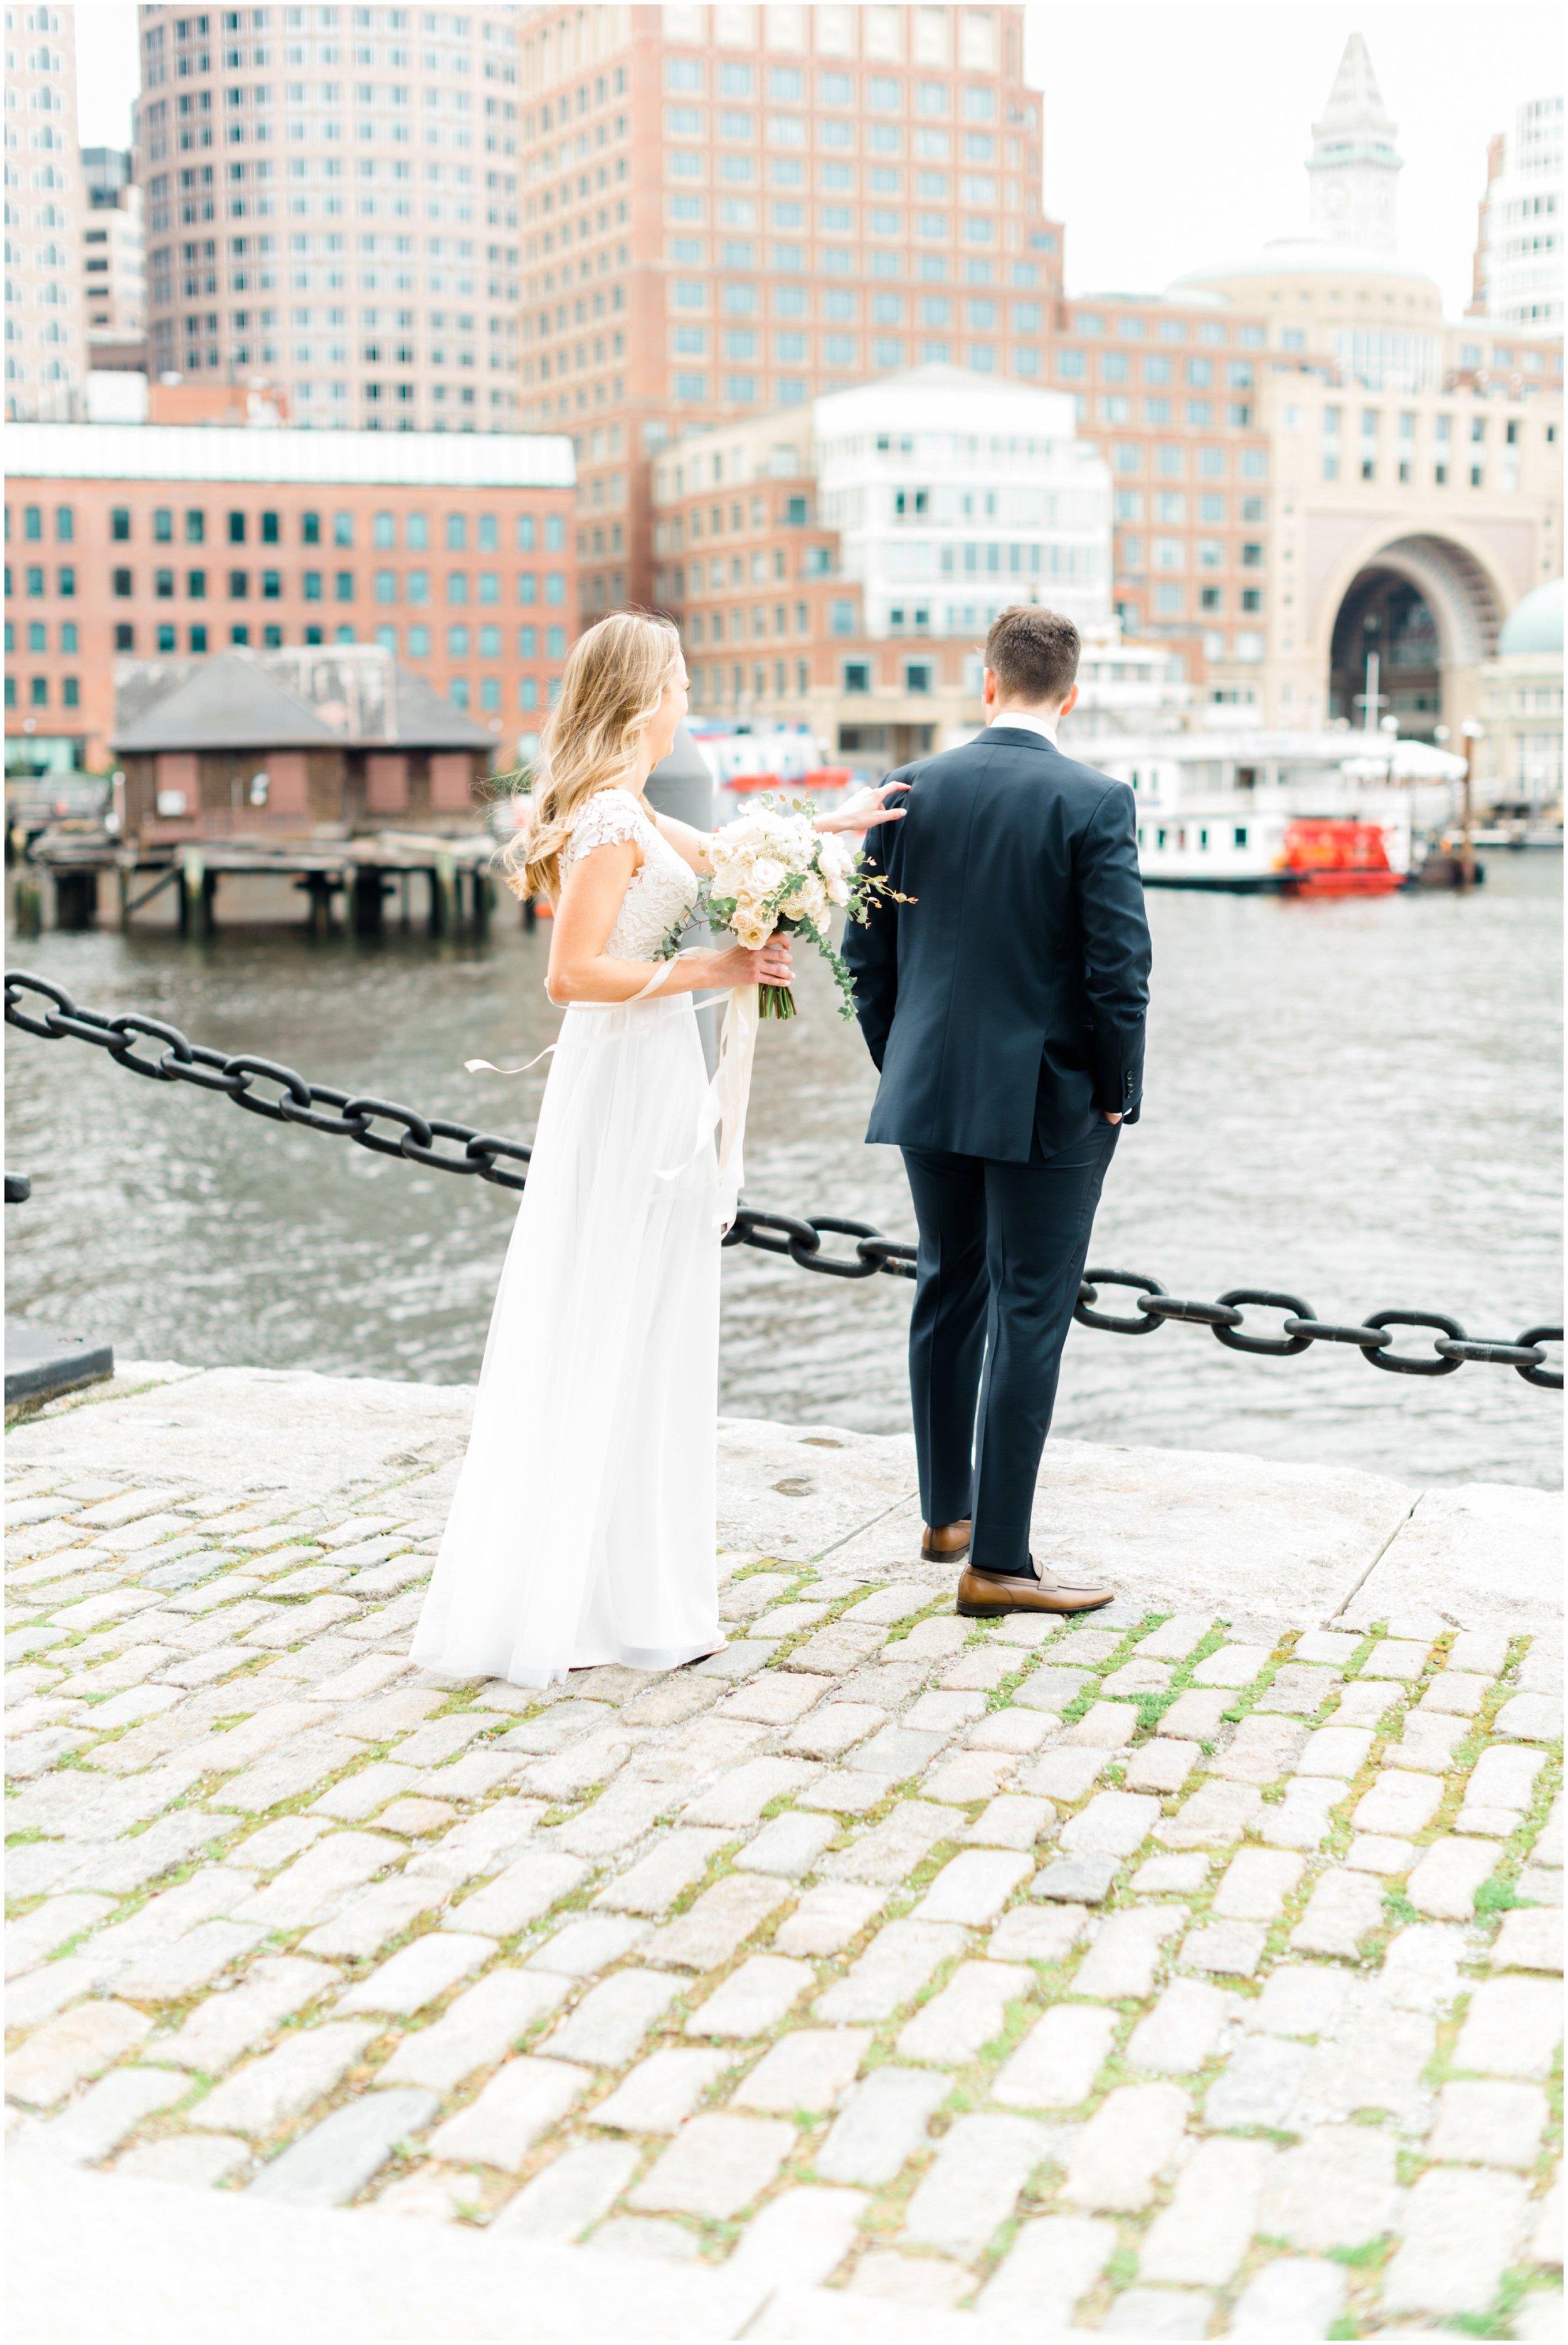 jay-robin-married-row-34-boston-11.jpg